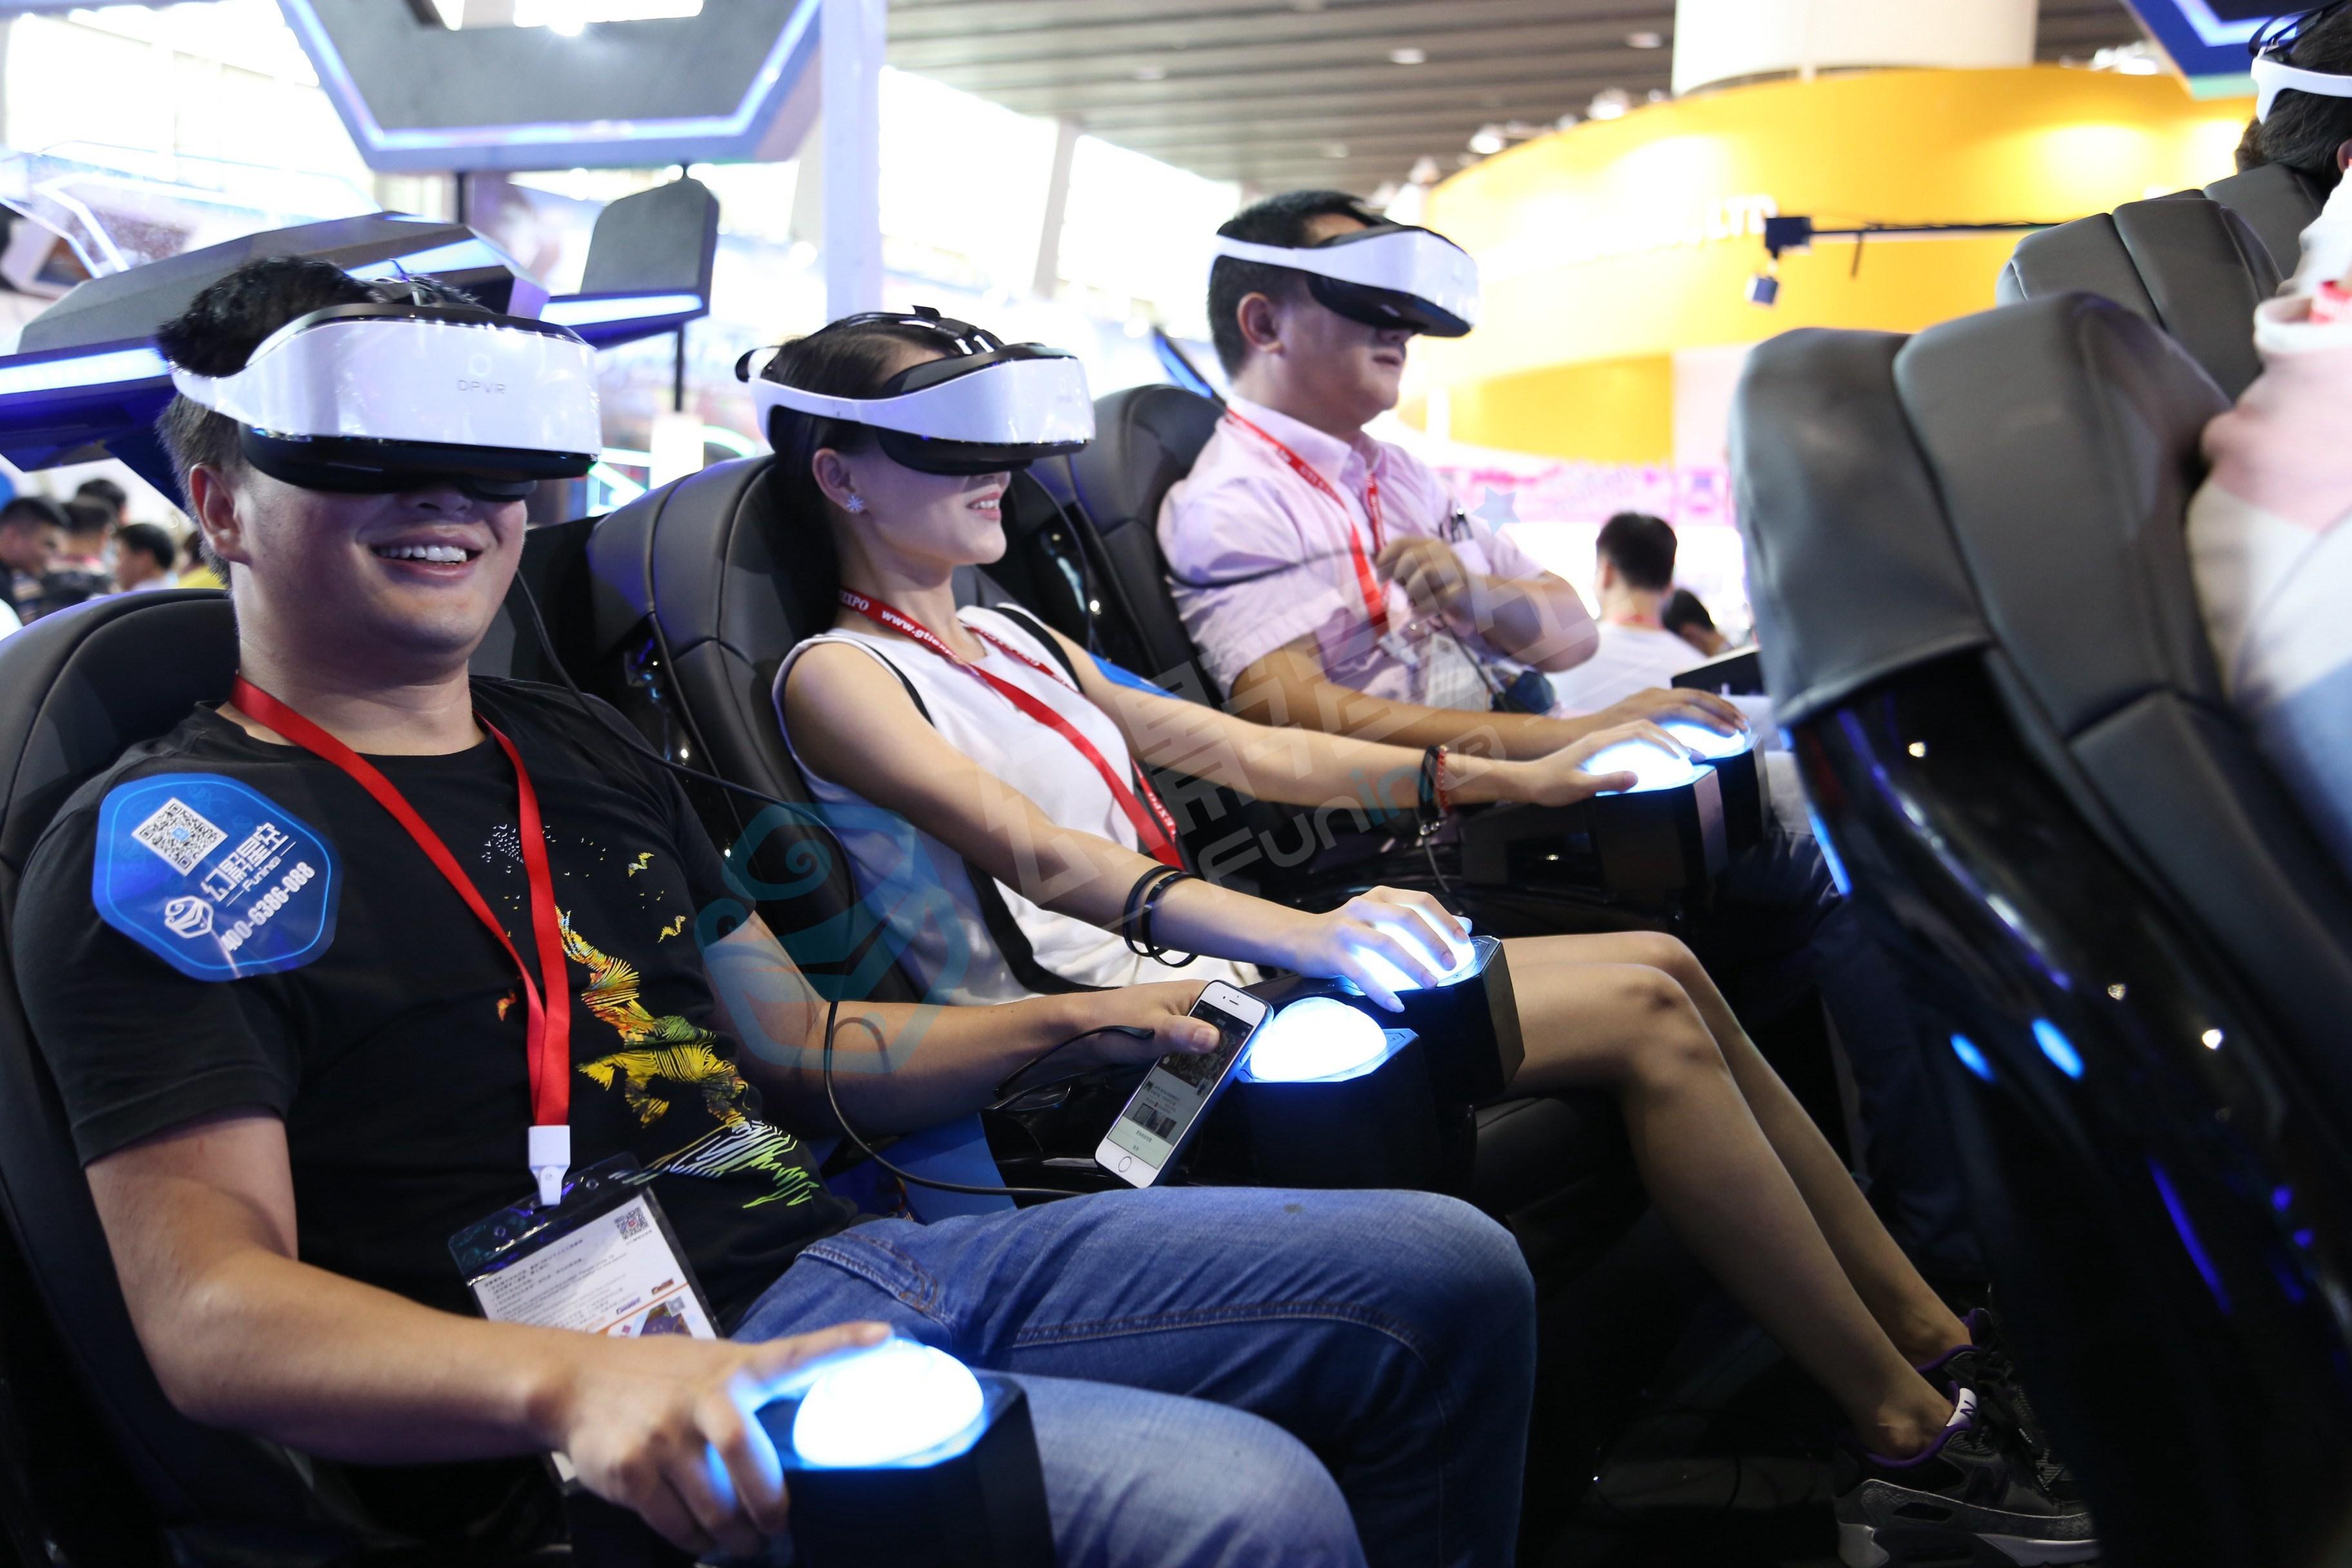 VR体验馆加盟店的利与弊 未来商店的模板?